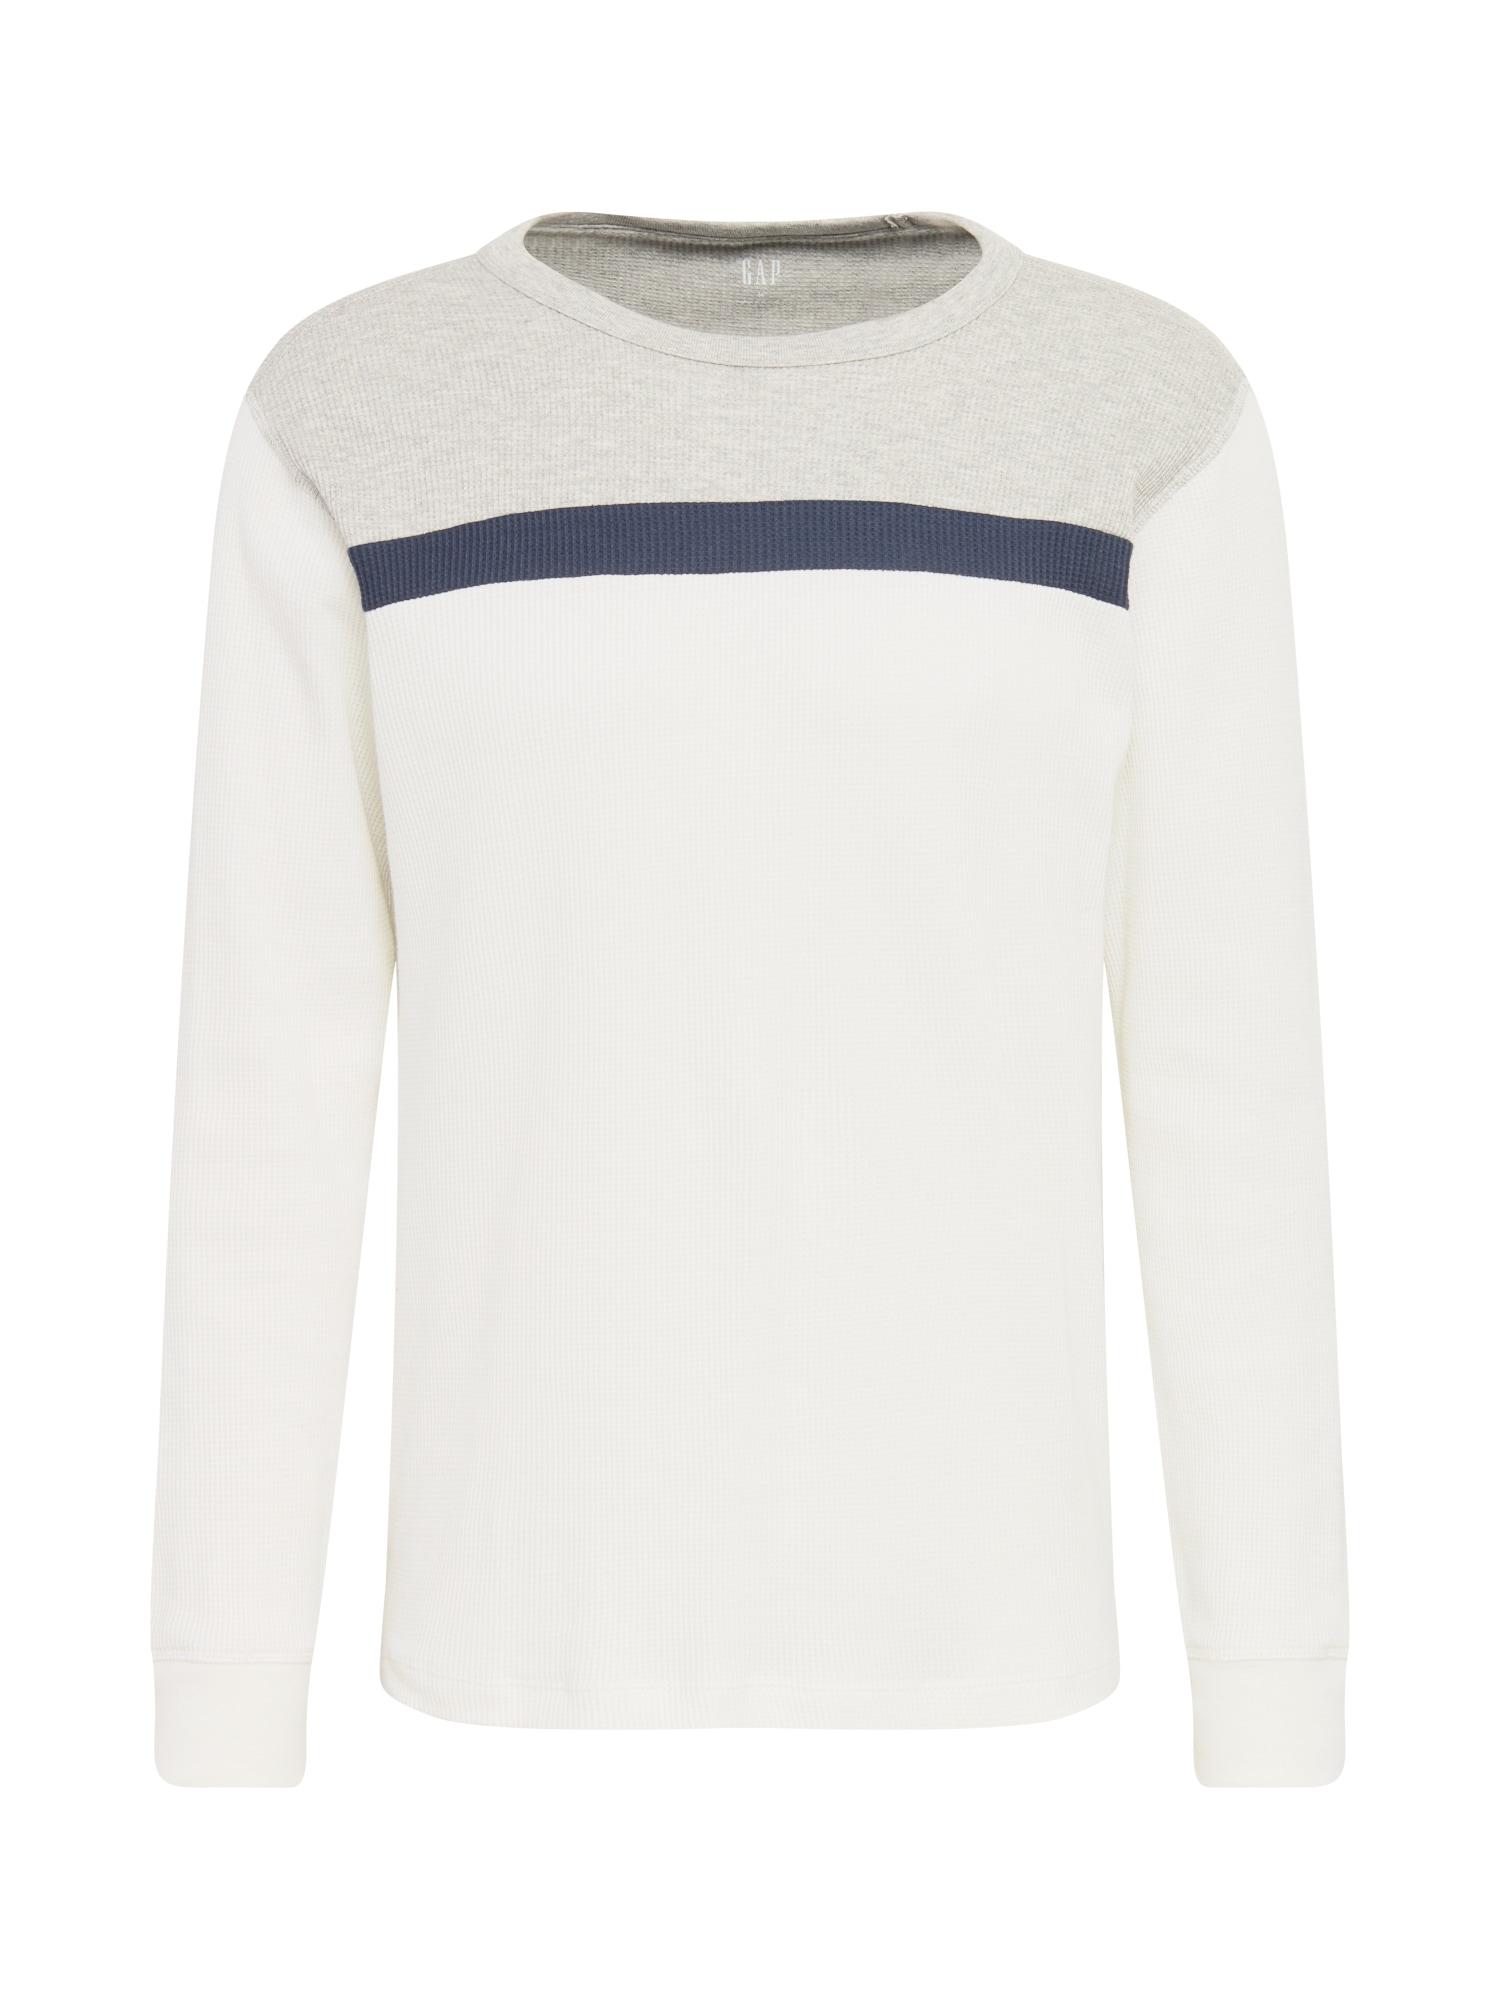 GAP Tričko 'YOKE'  bílá / šedá / námořnická modř